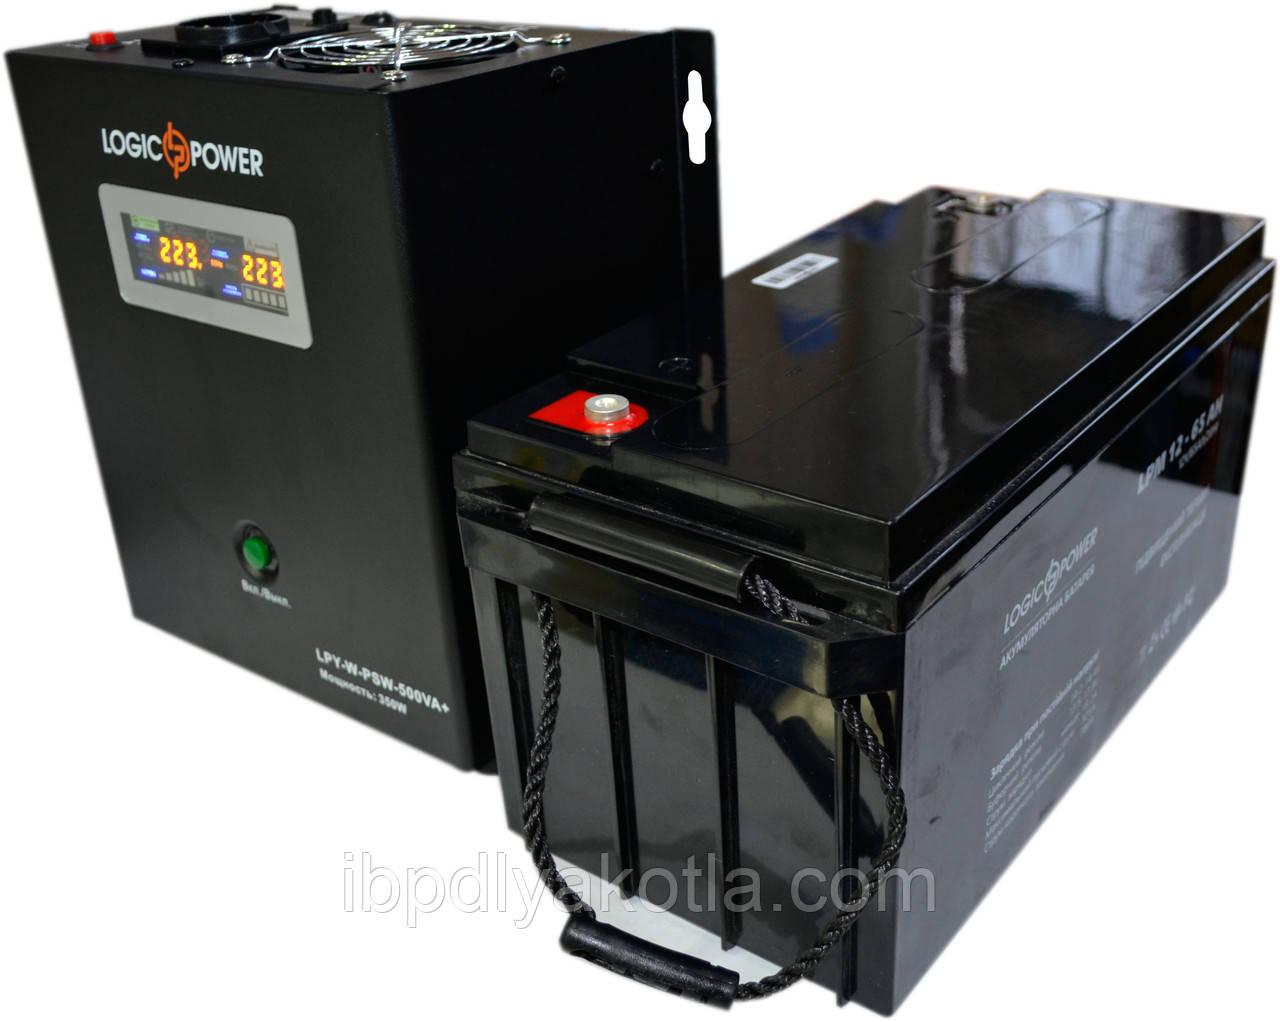 Комплект резервного питания ИБП Logicpower LPY-W-PSW-500 + АКБ LPM12-65 для 5-7ч работы газового котла